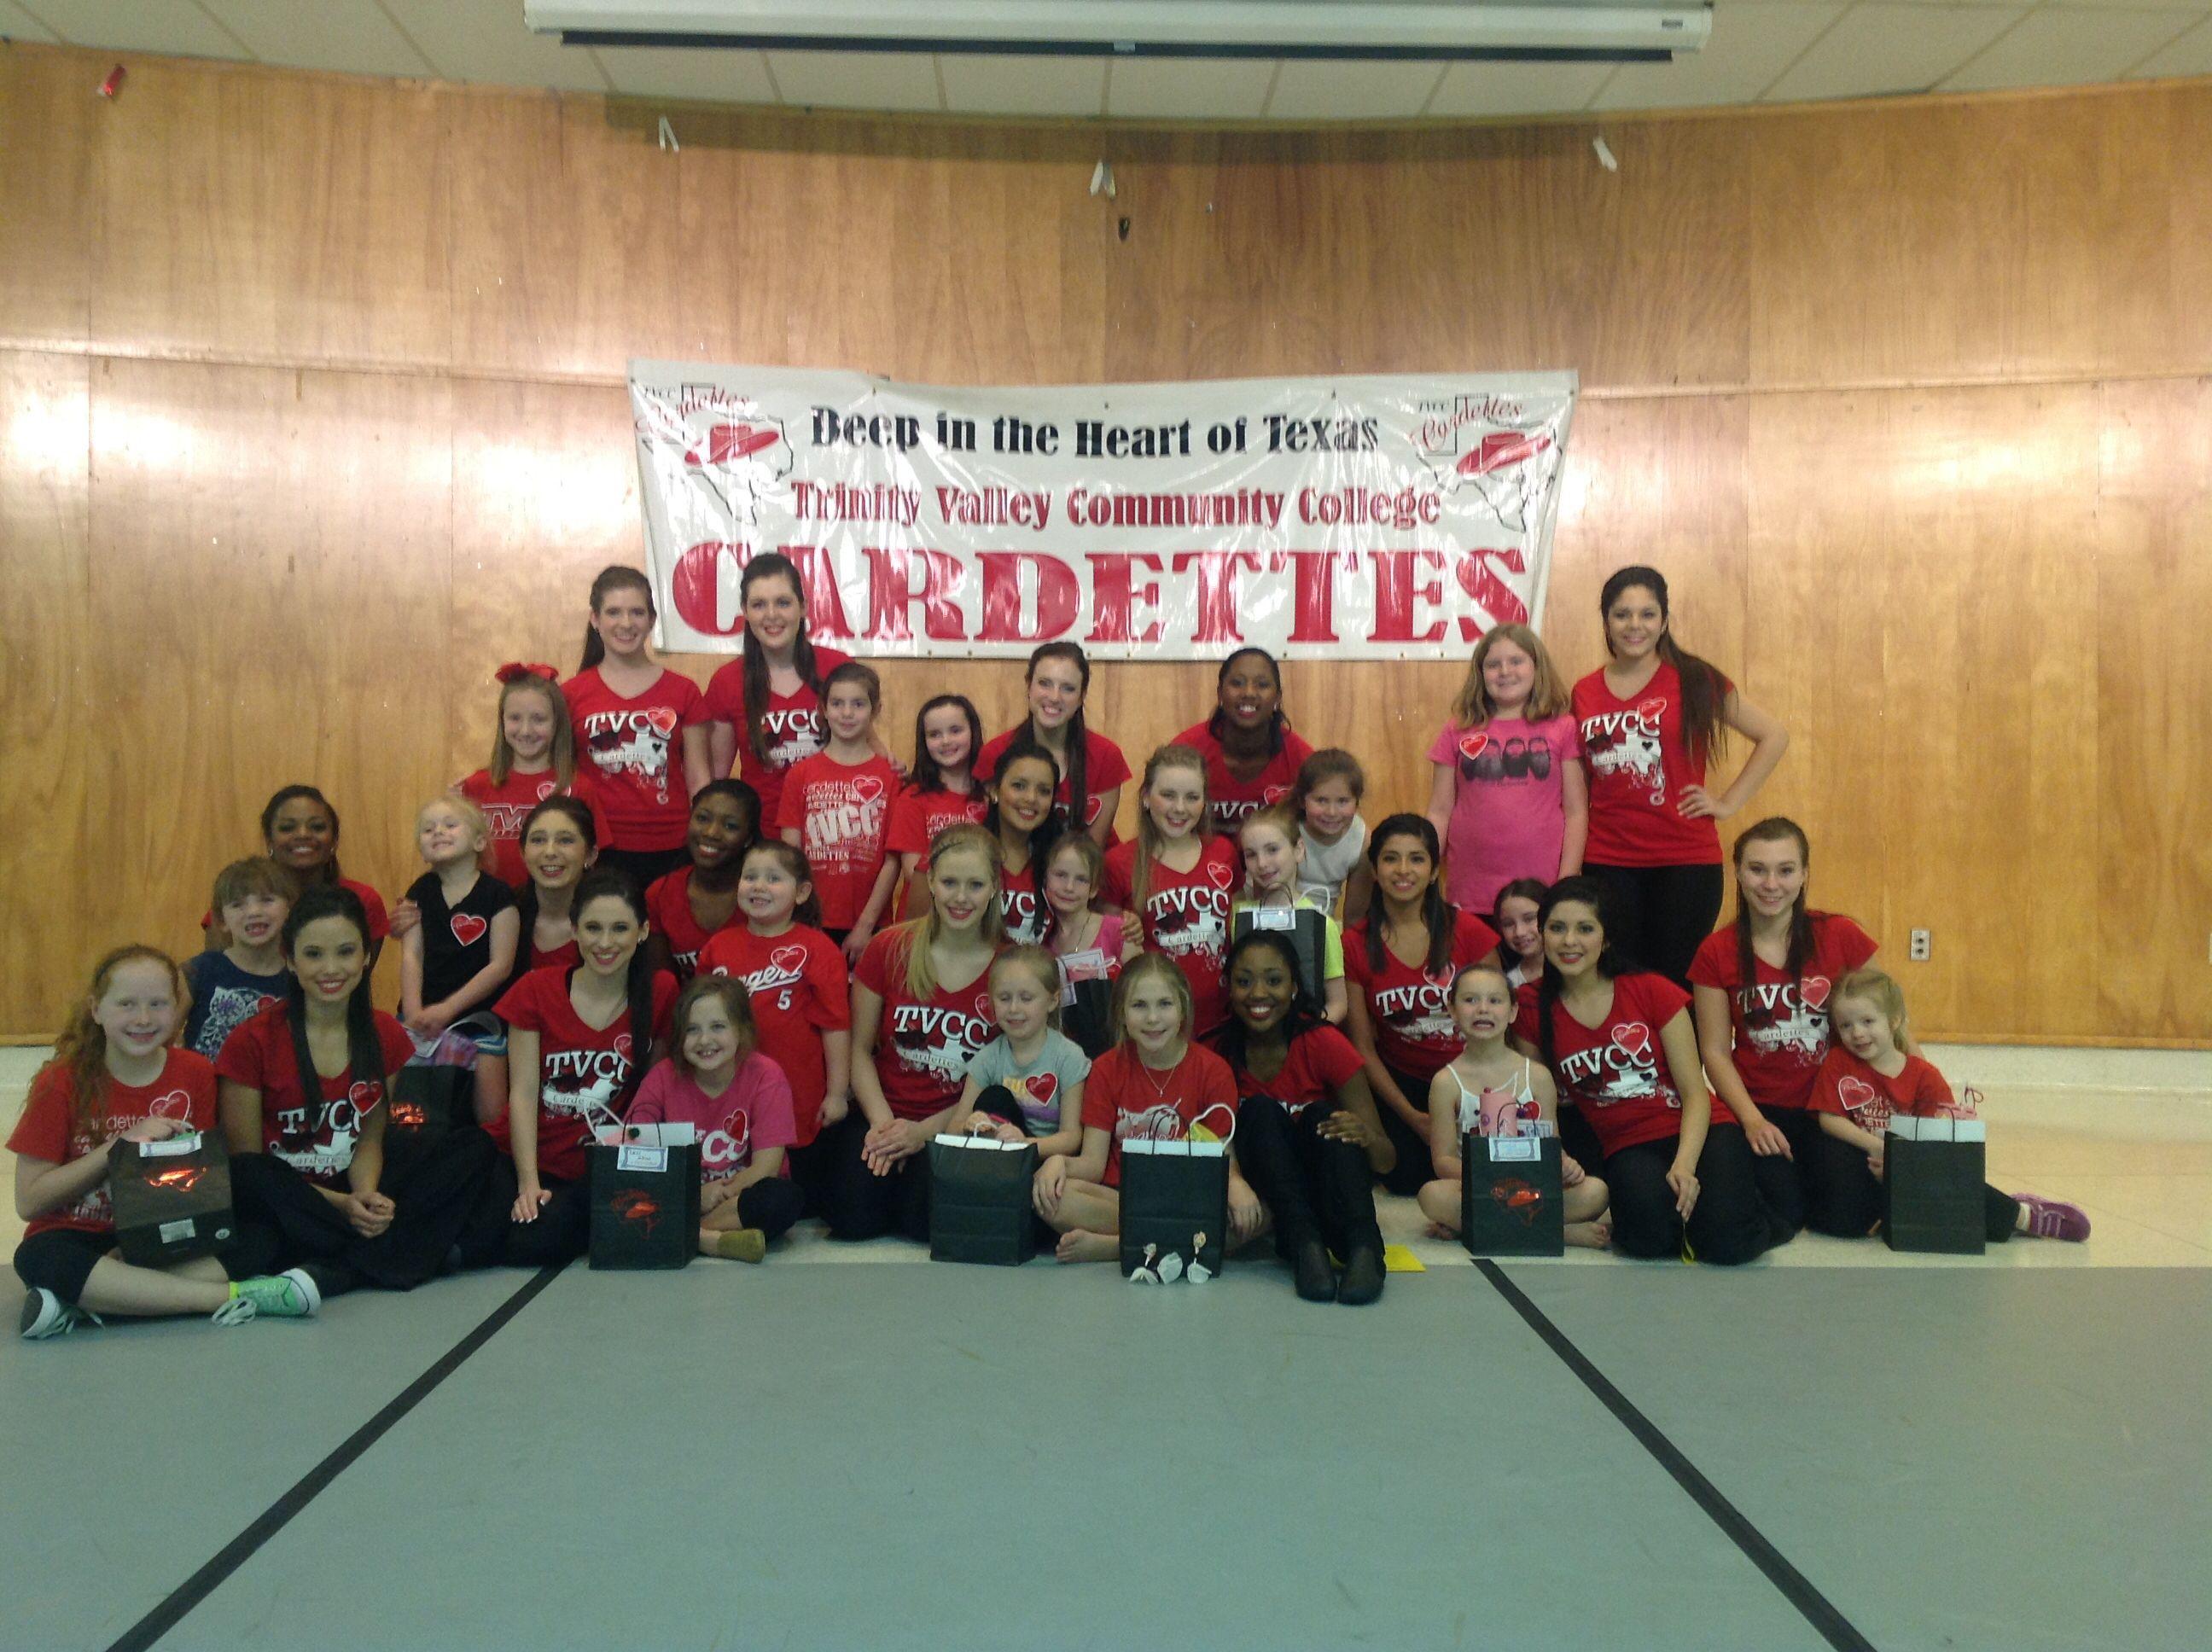 2014 Tvcc Cardette Kids Clinic In The Heart Kids Pride